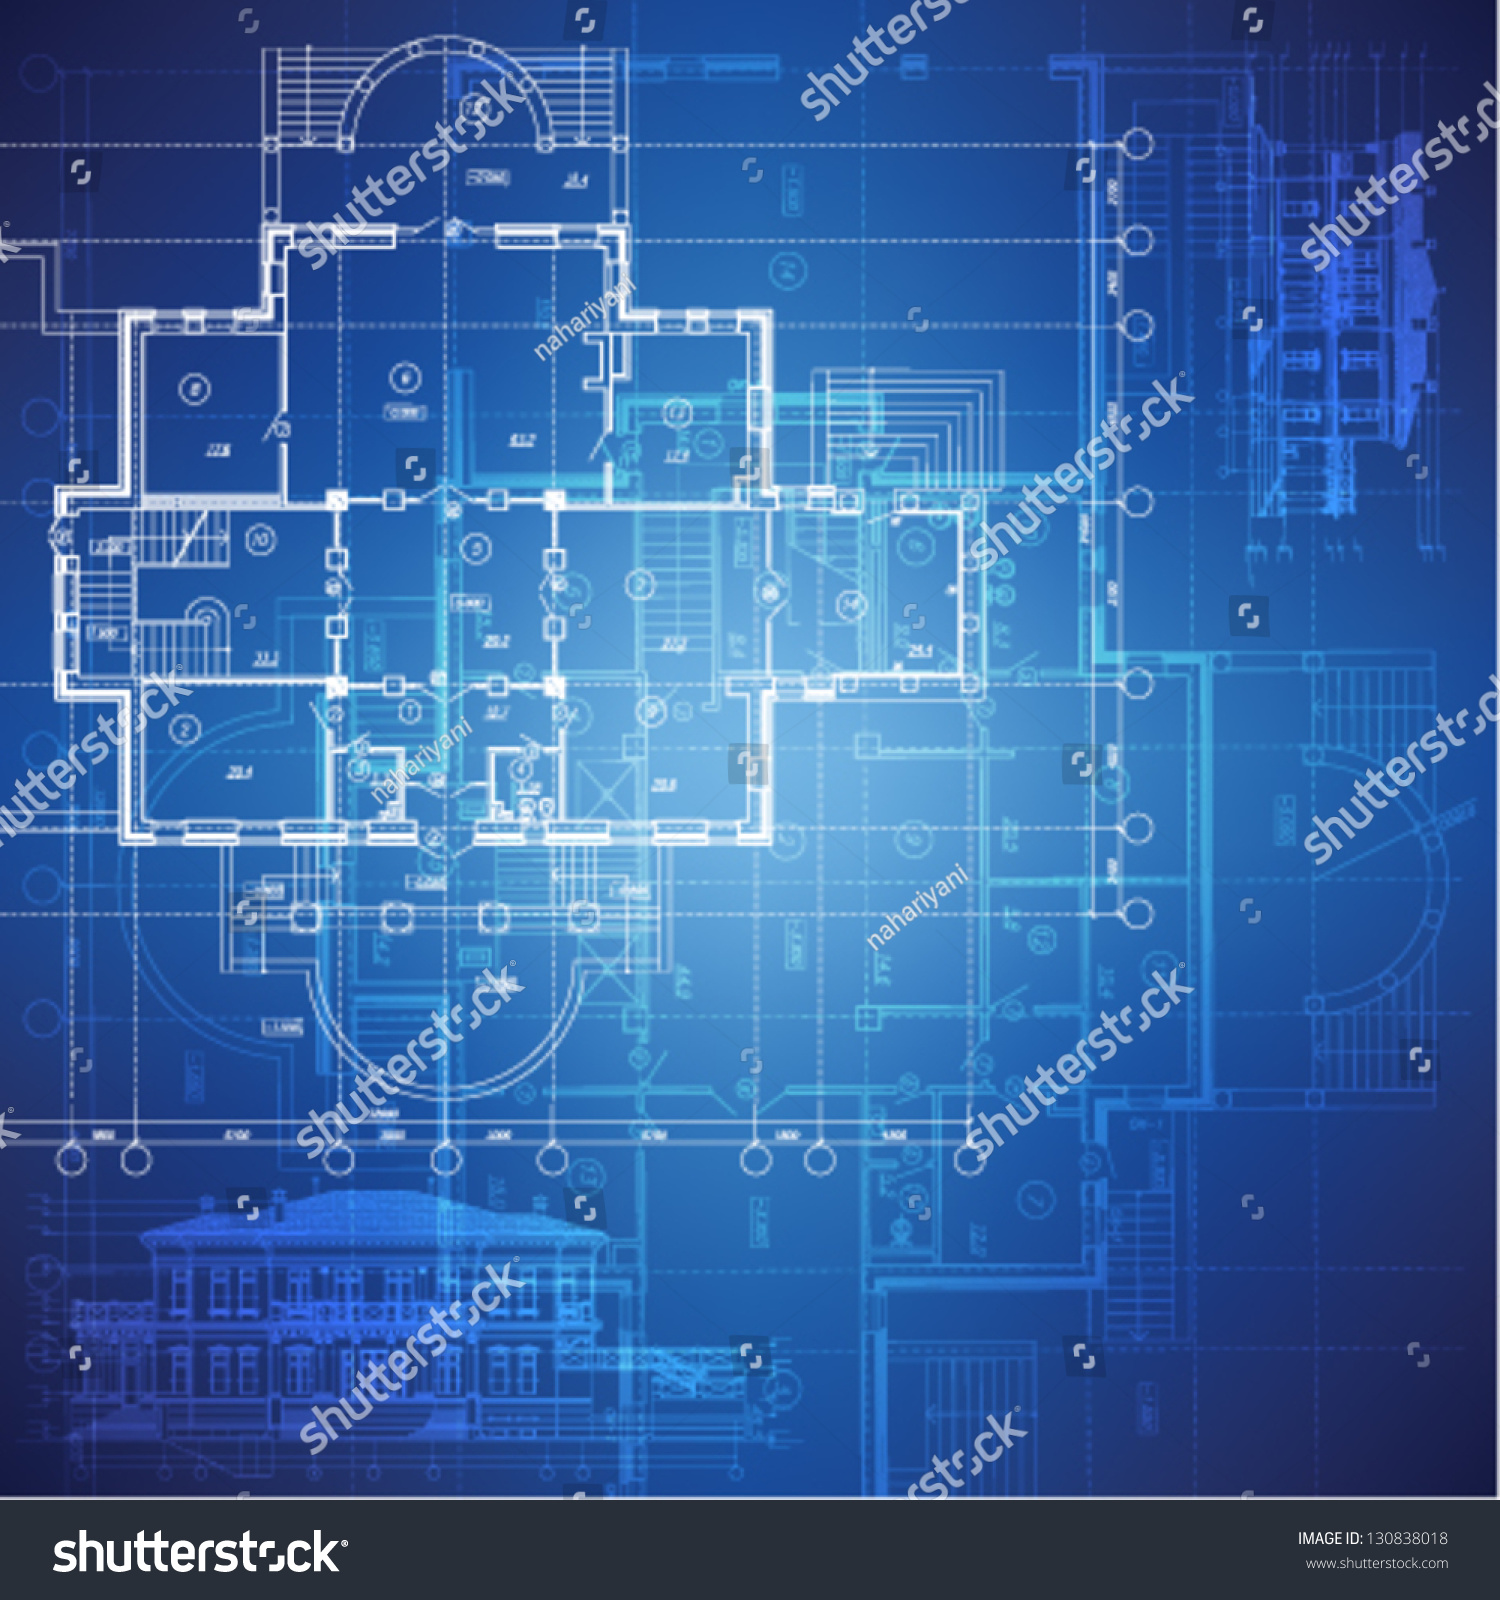 Urban Blueprint Vector Architectural Background Building